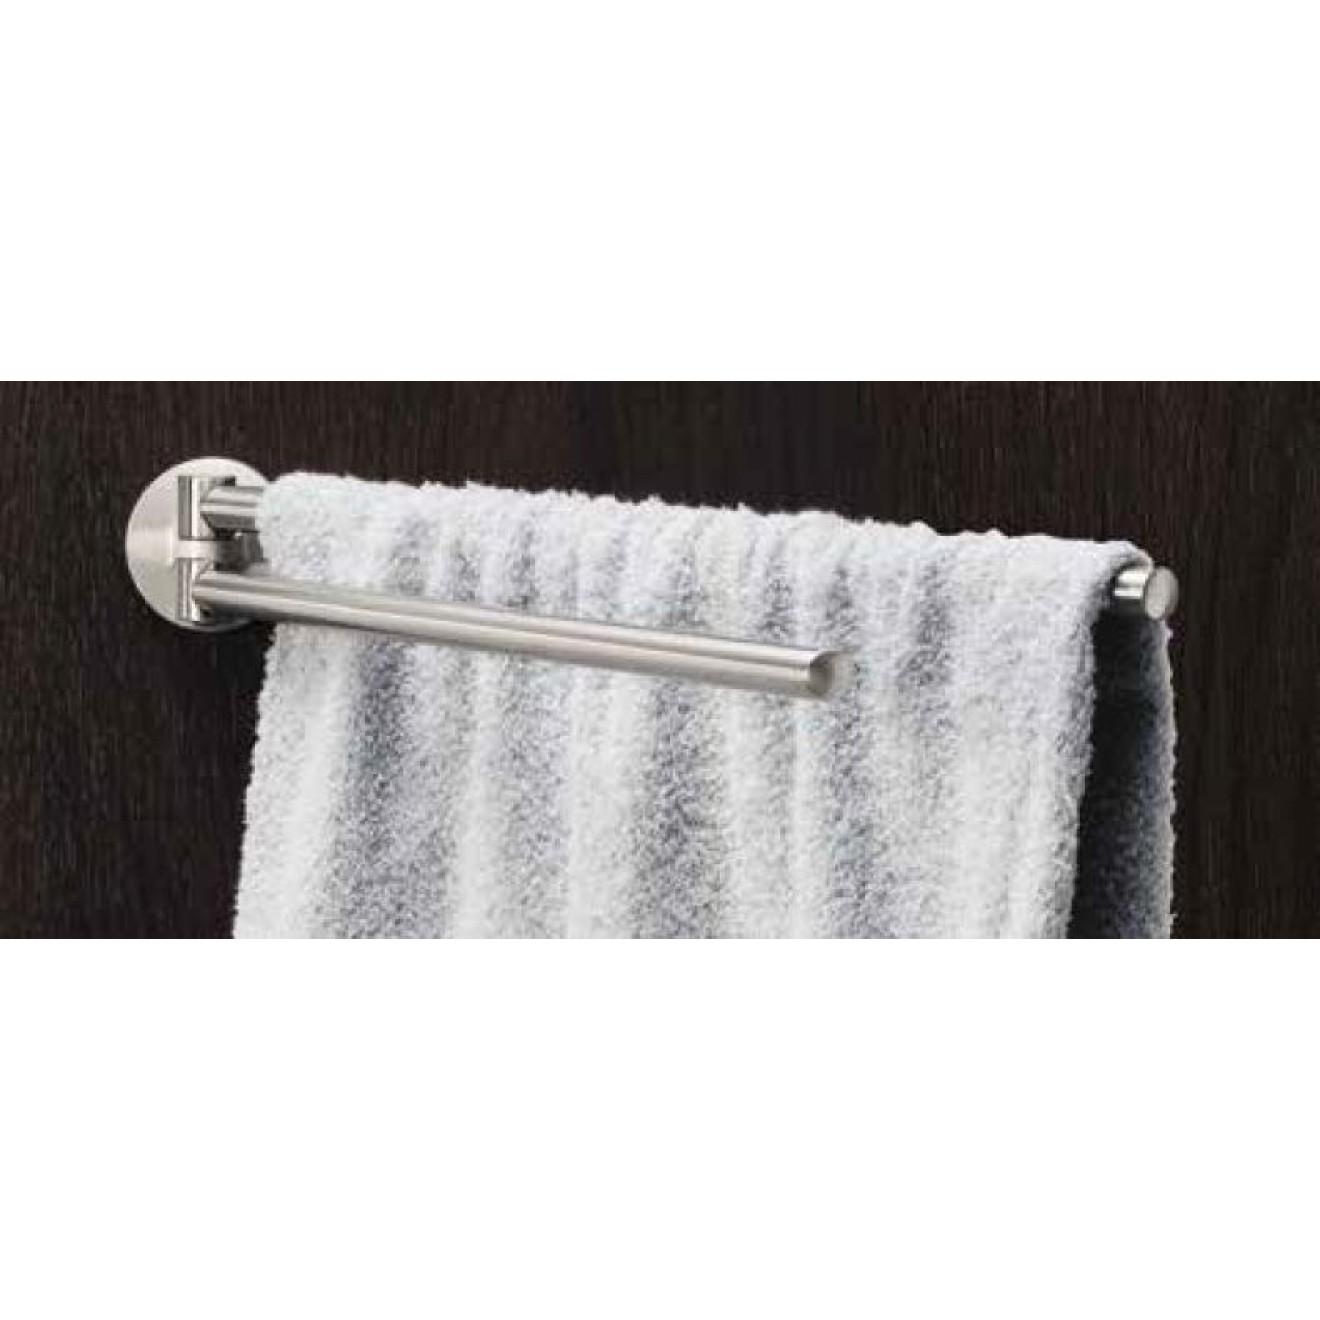 handtuchhalter 2 armig schwenkbar 47 cm edelstahl geb rstet rosette rund treffpunkt bad der. Black Bedroom Furniture Sets. Home Design Ideas